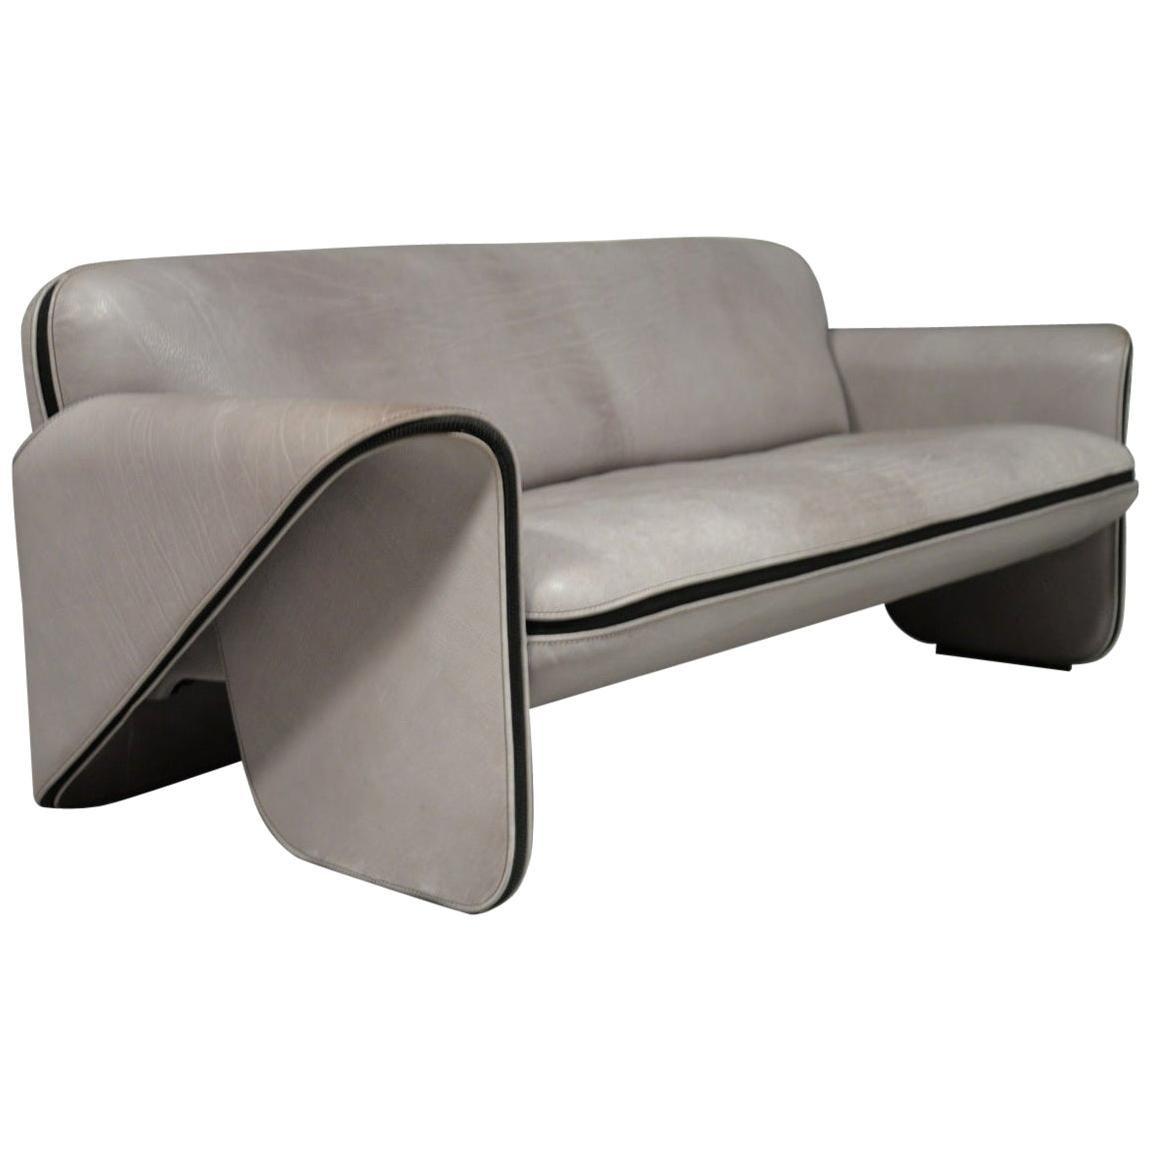 Vintage De Sede 'DS 125' Sofa Designed by Gerd Lange, Switzerland, 1978